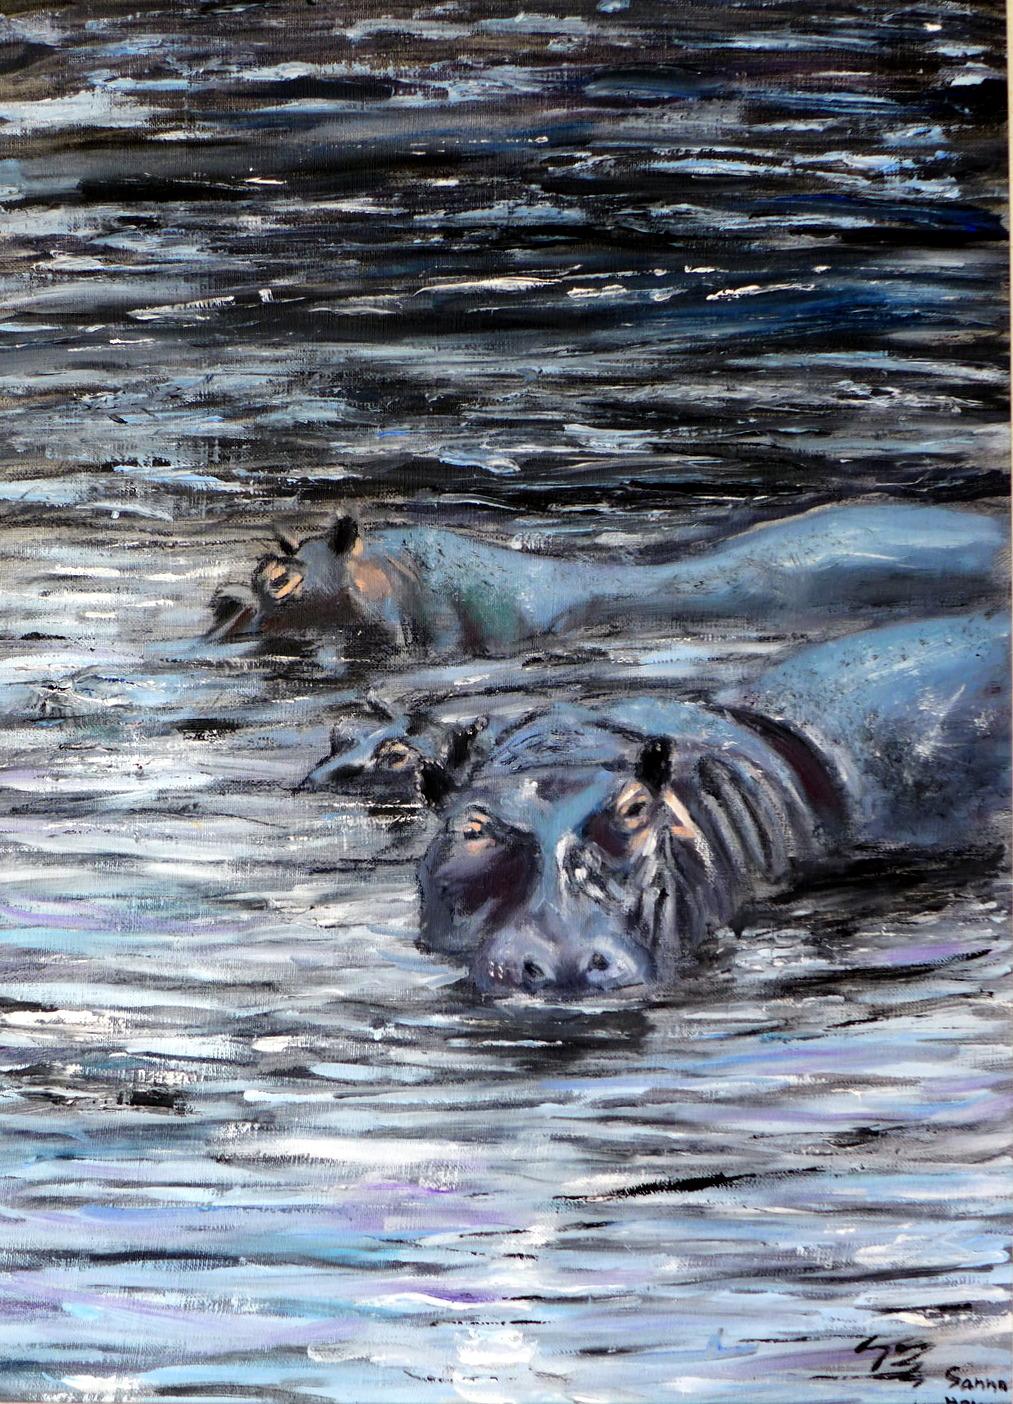 Hippos drifting - ©sanna holm 2014